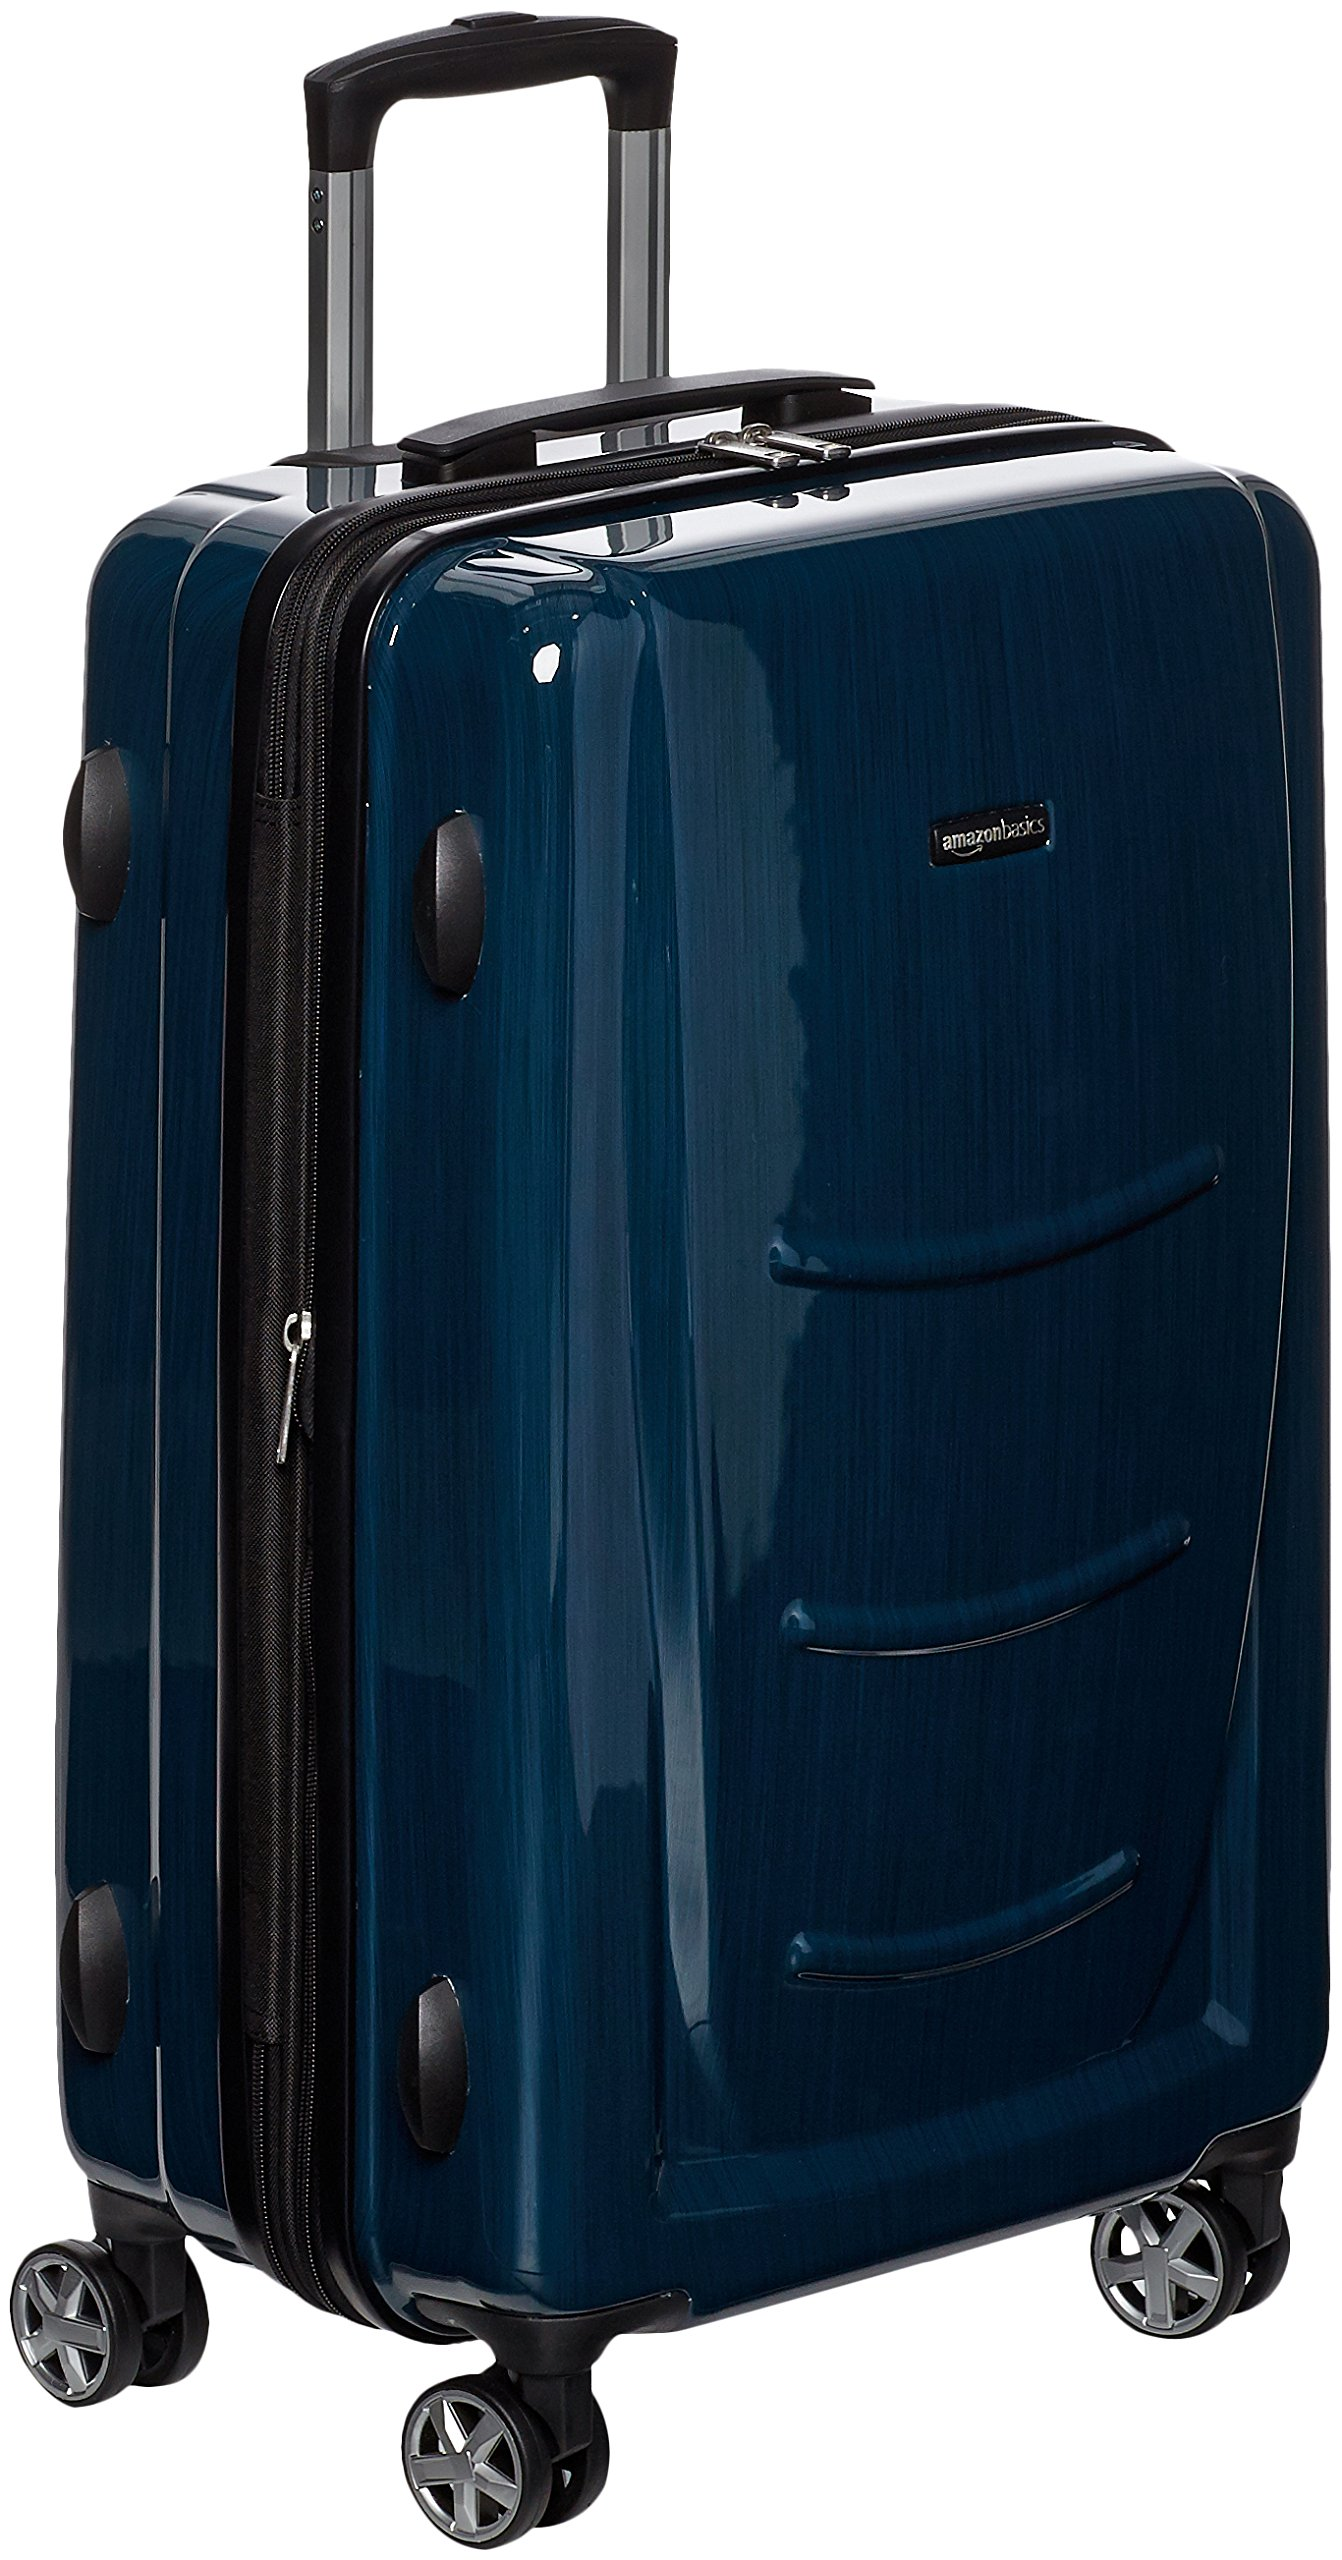 AmazonBasics Hardshell Spinner - 20'' Cabin Size, Navy Blue